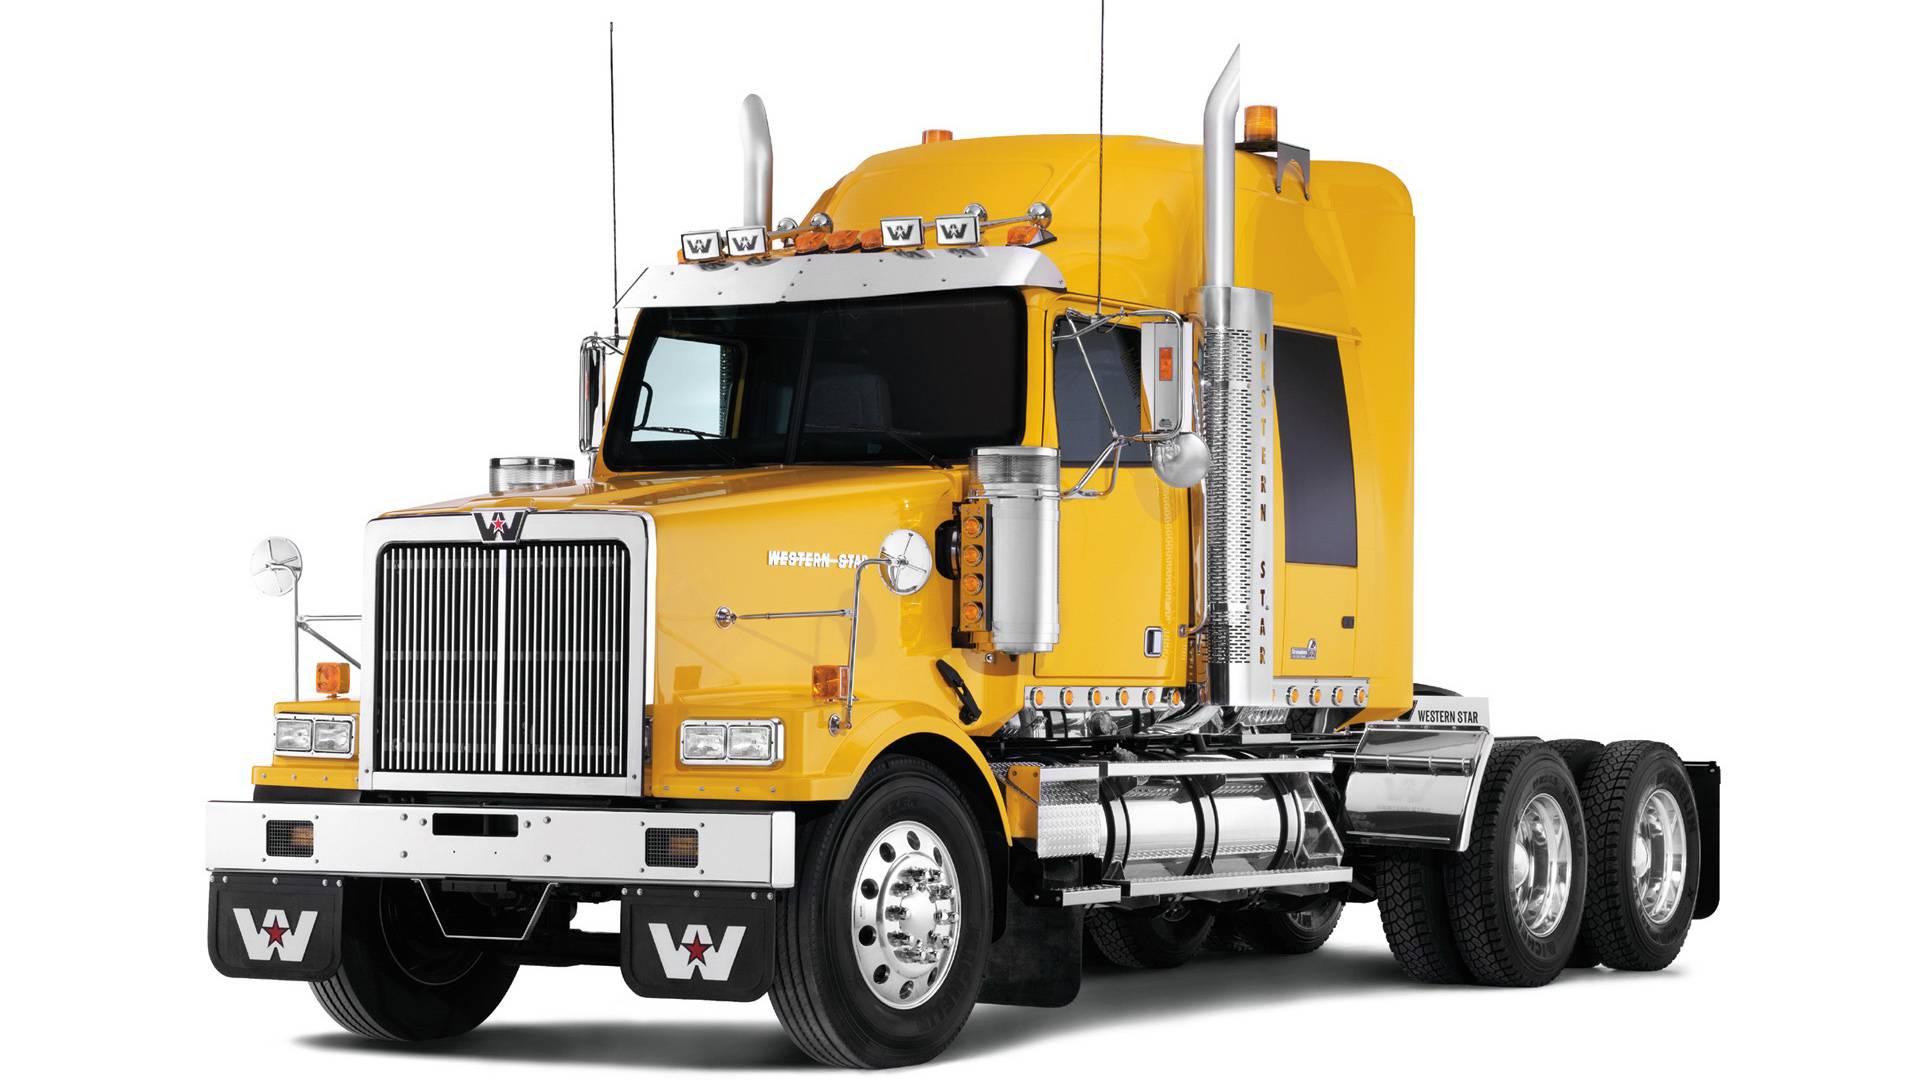 lorry-png-hd-best-dodge-trucks-original-yellow-western-wallpaper-hq-1920